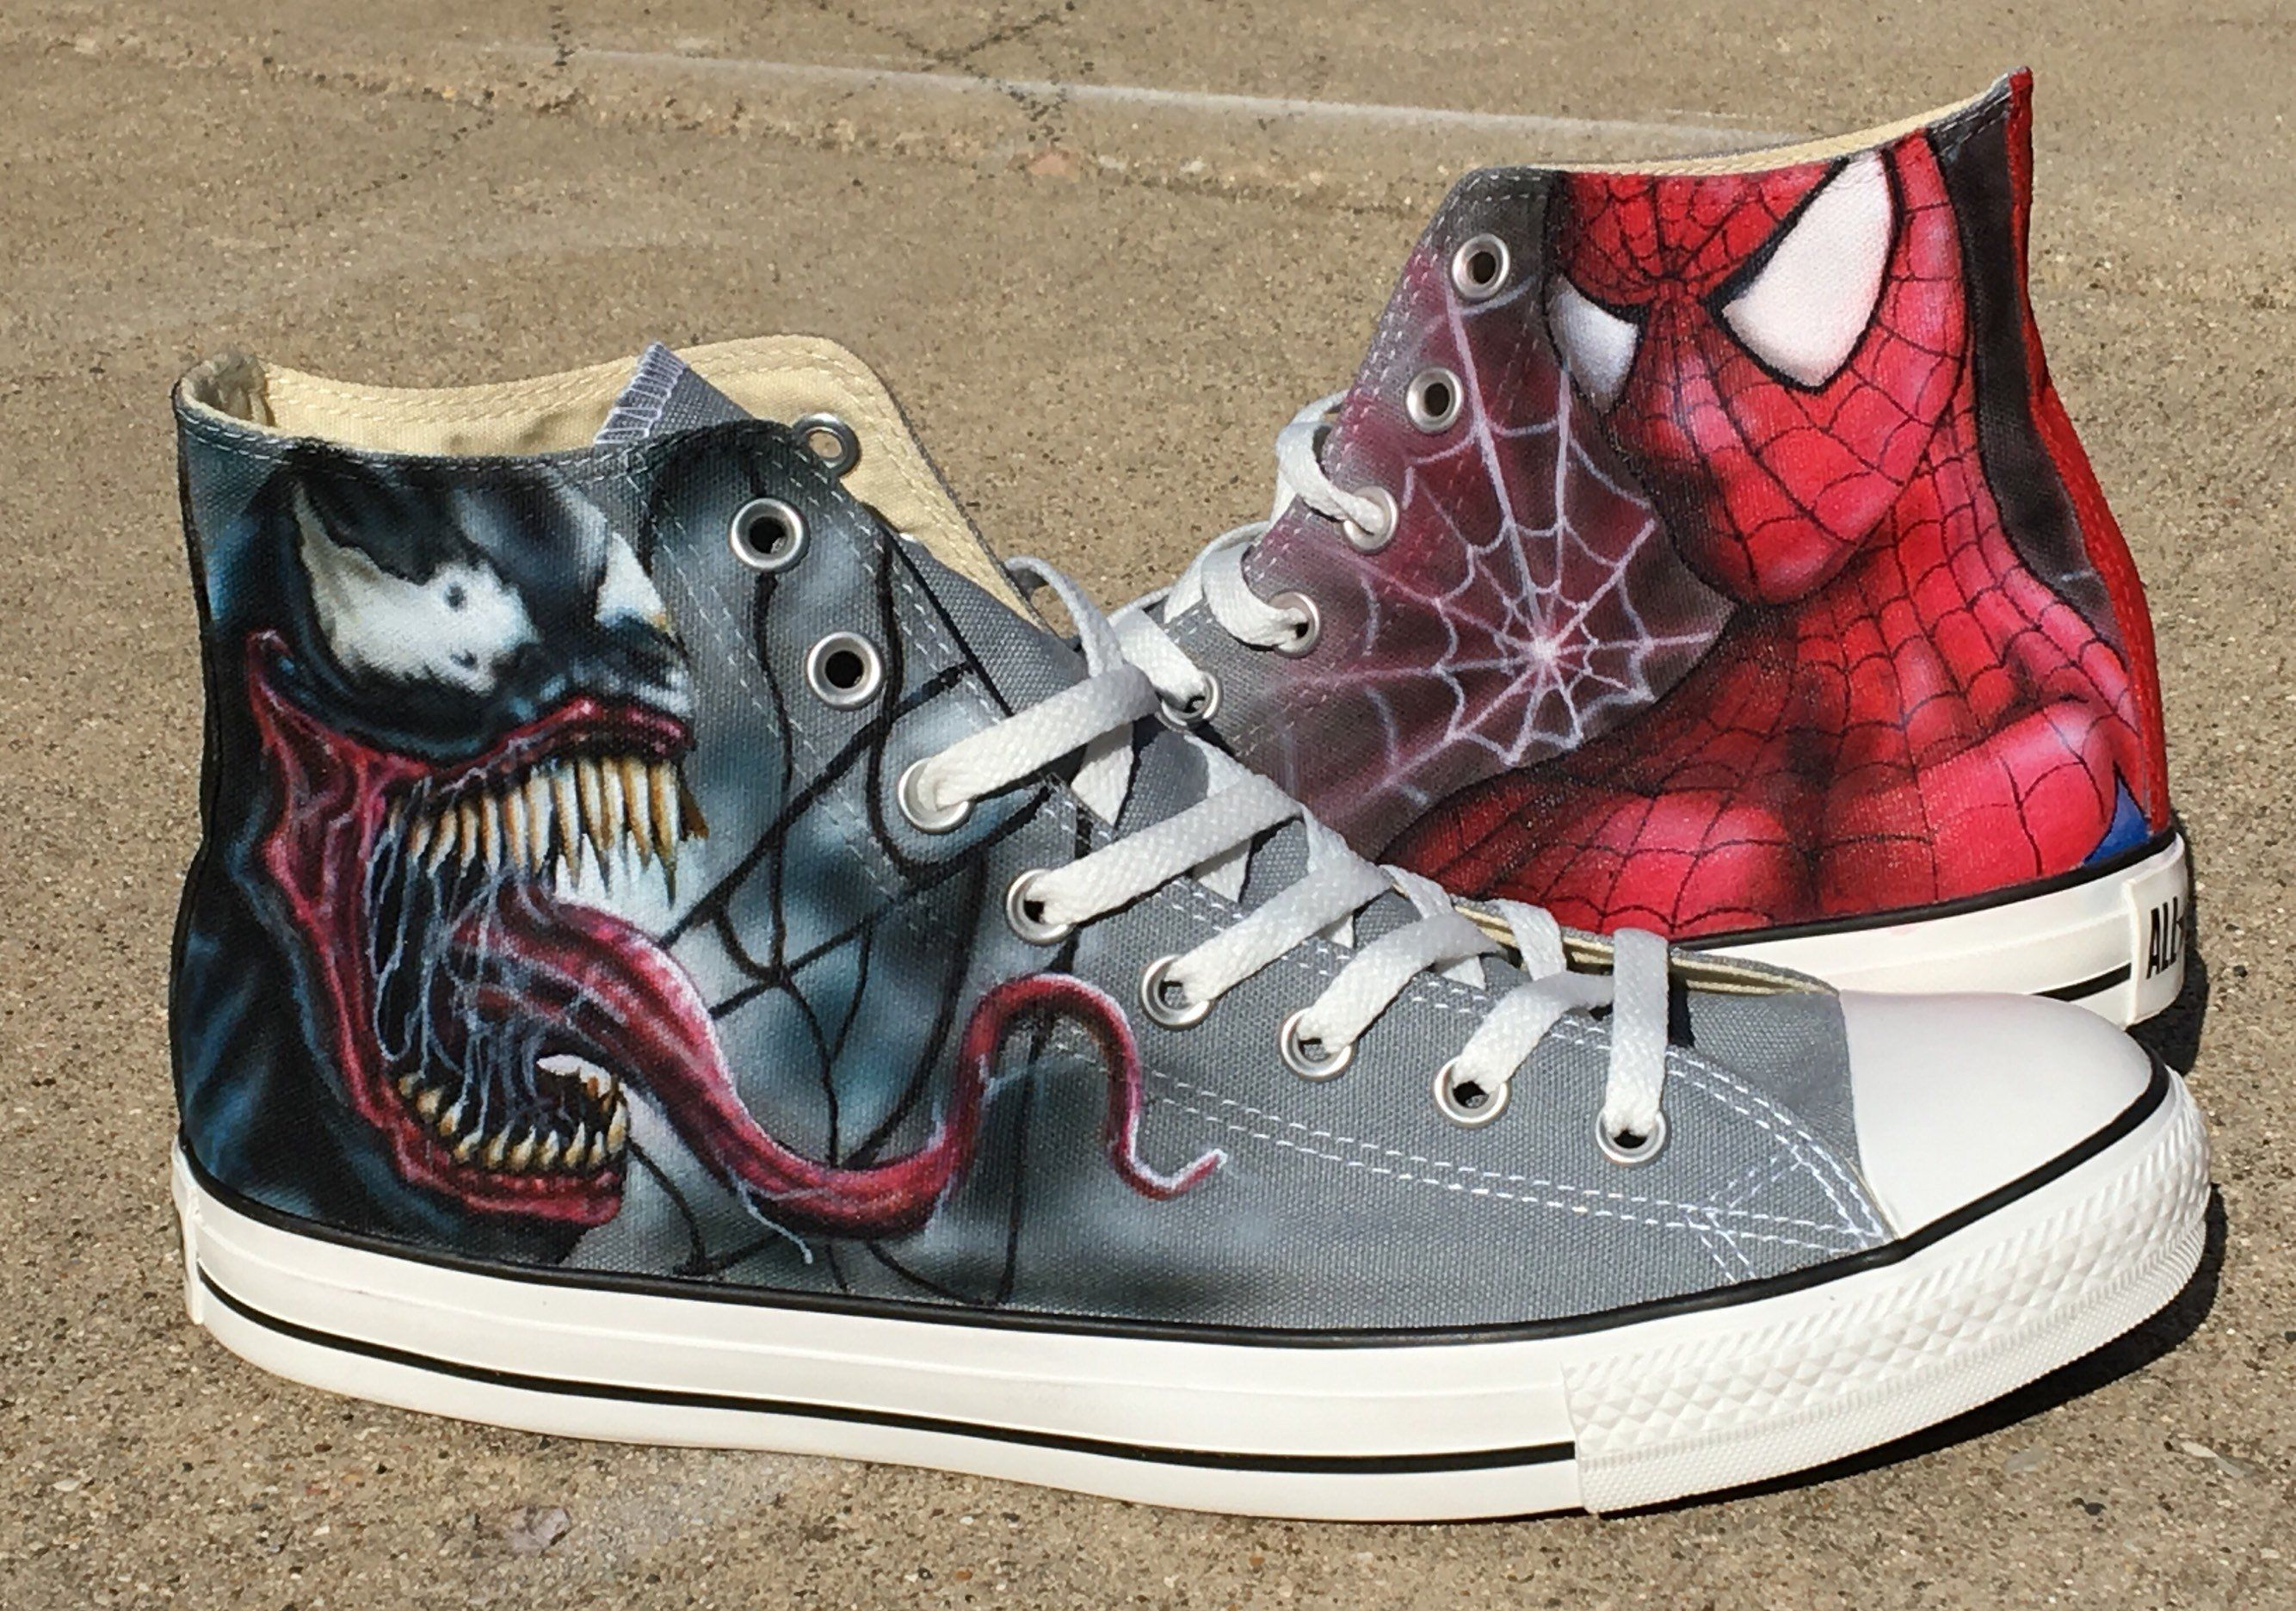 Spider Man Custom Converse White